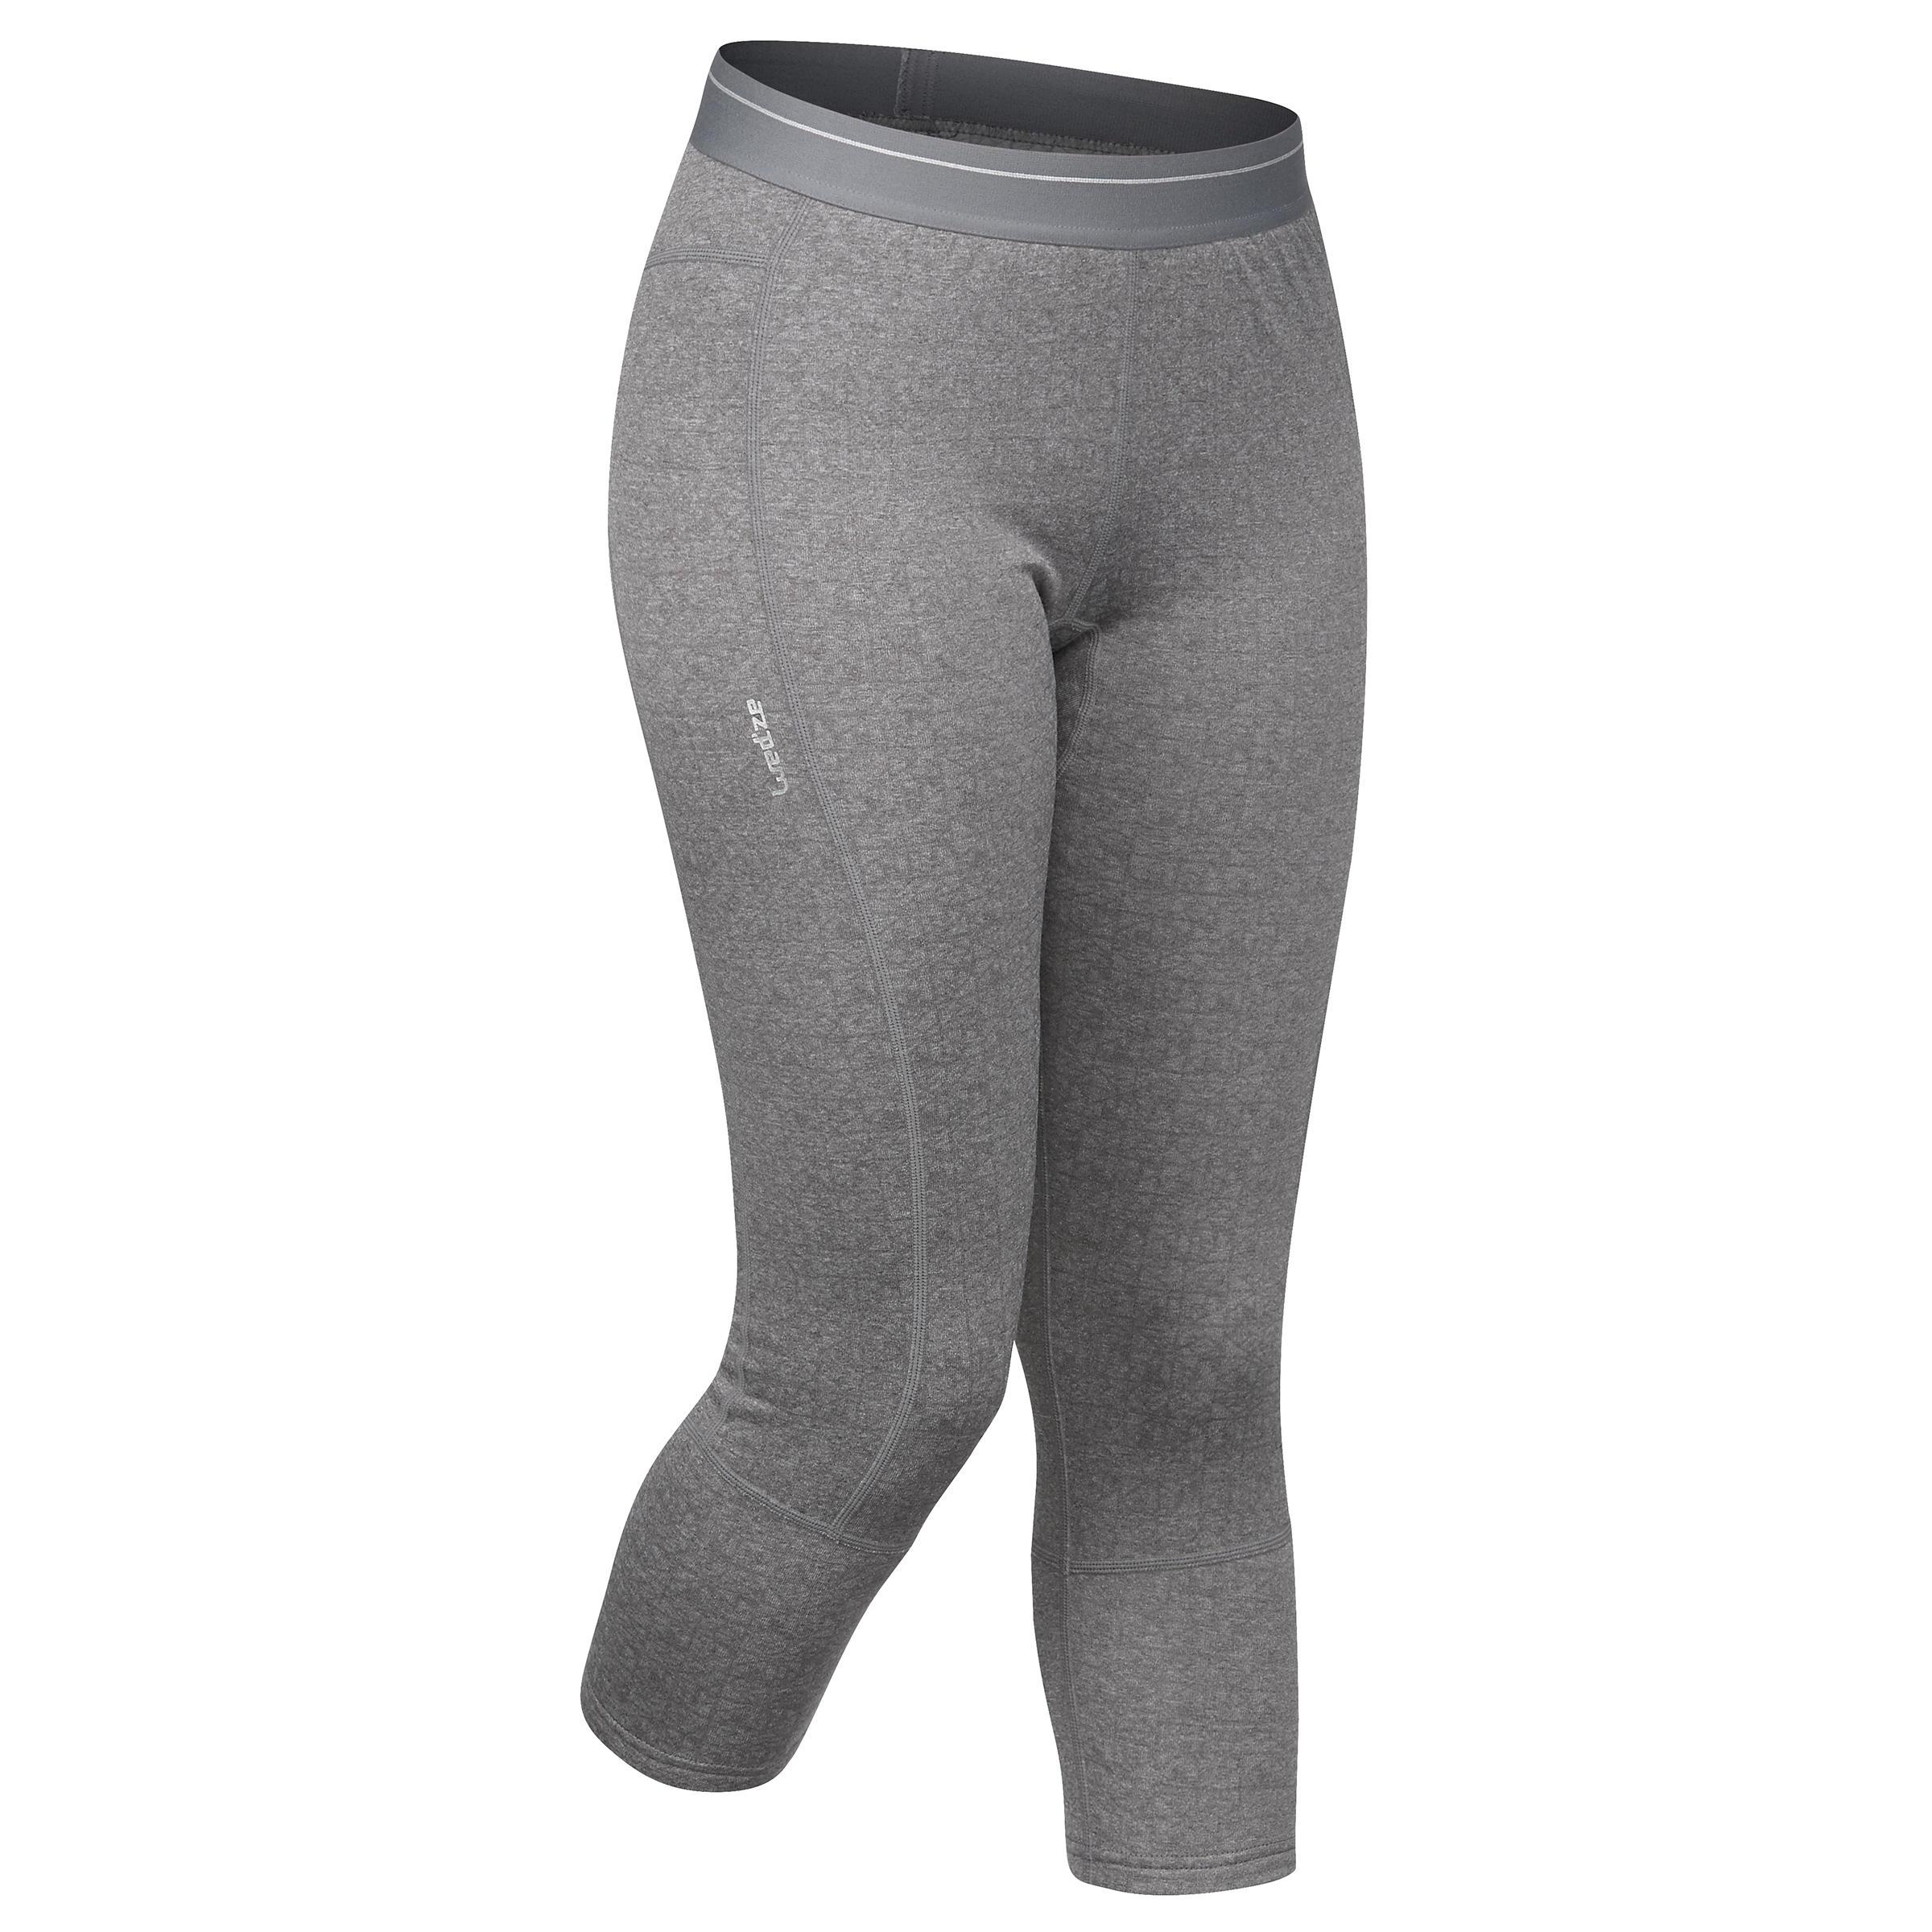 Skiunterhose Funktionshose 500 Damen grau | Sportbekleidung > Funktionswäsche > Thermounterwäsche | Grau | Polyester | Wed´ze